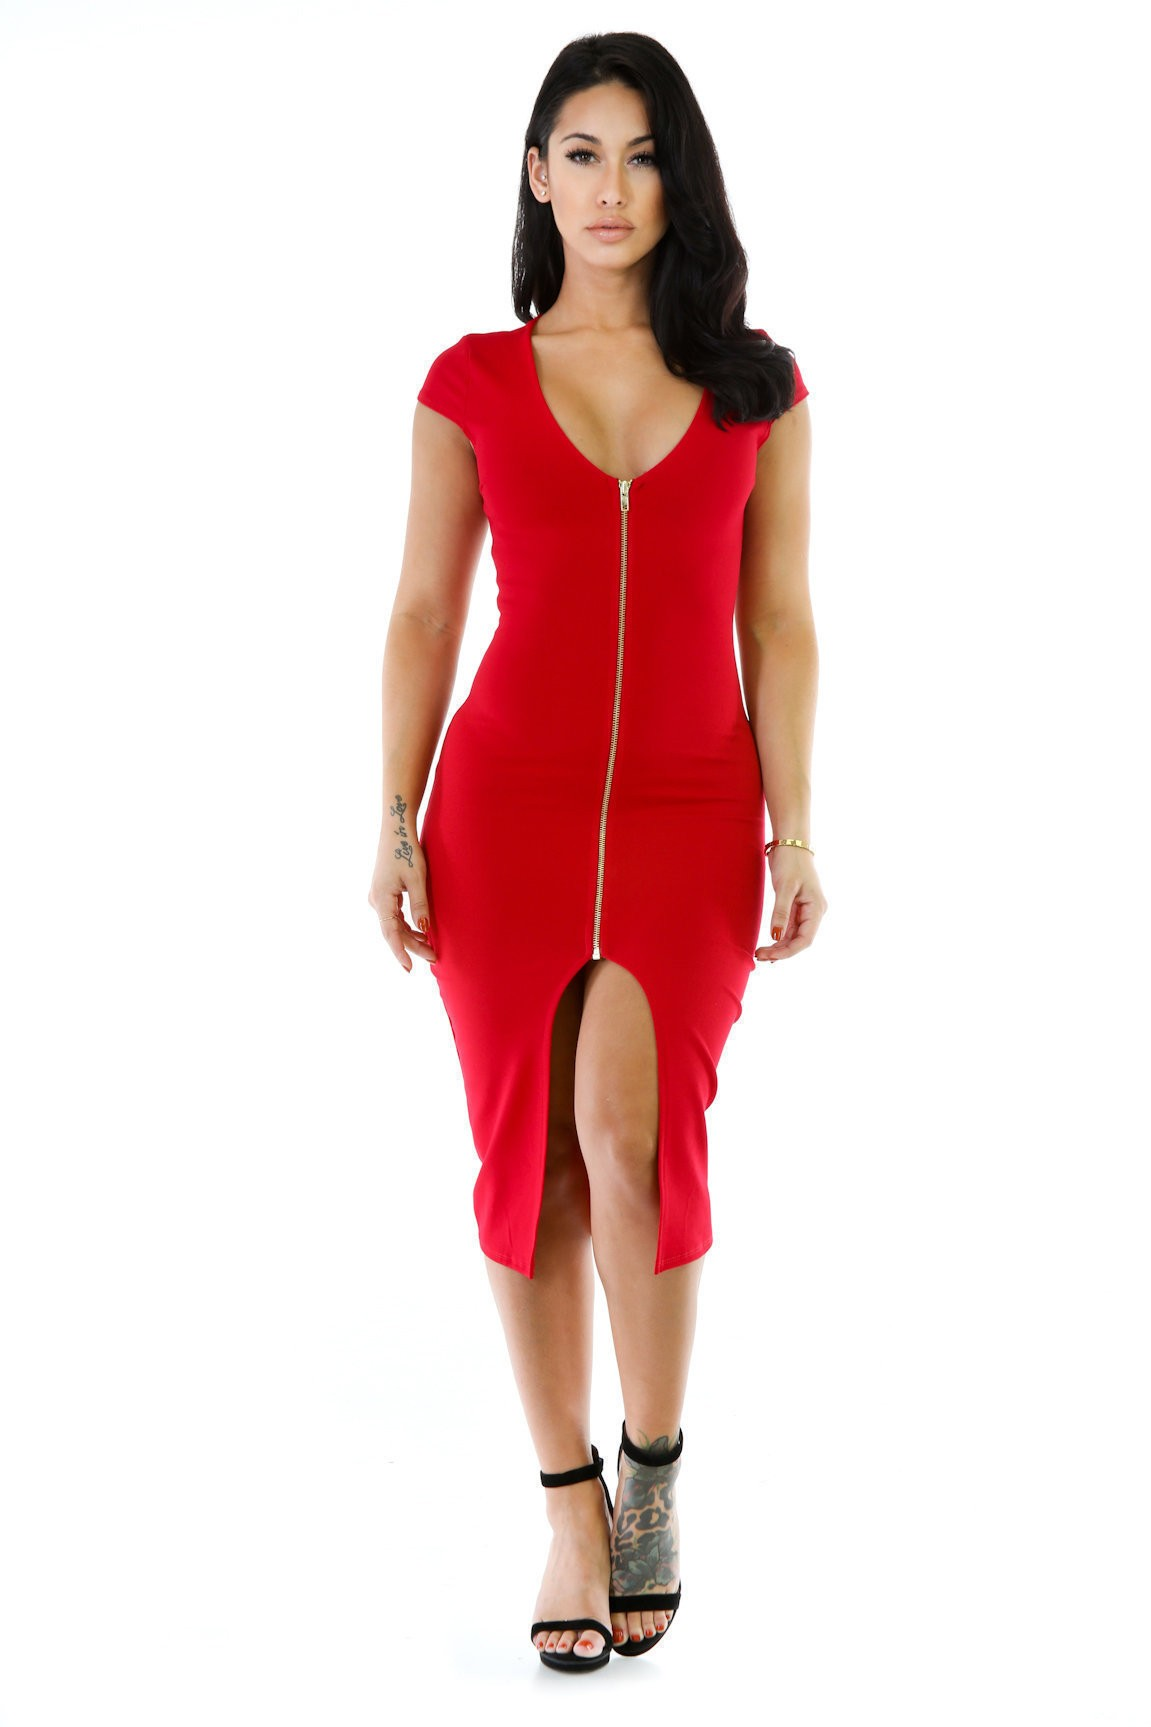 Zip Pose Dress